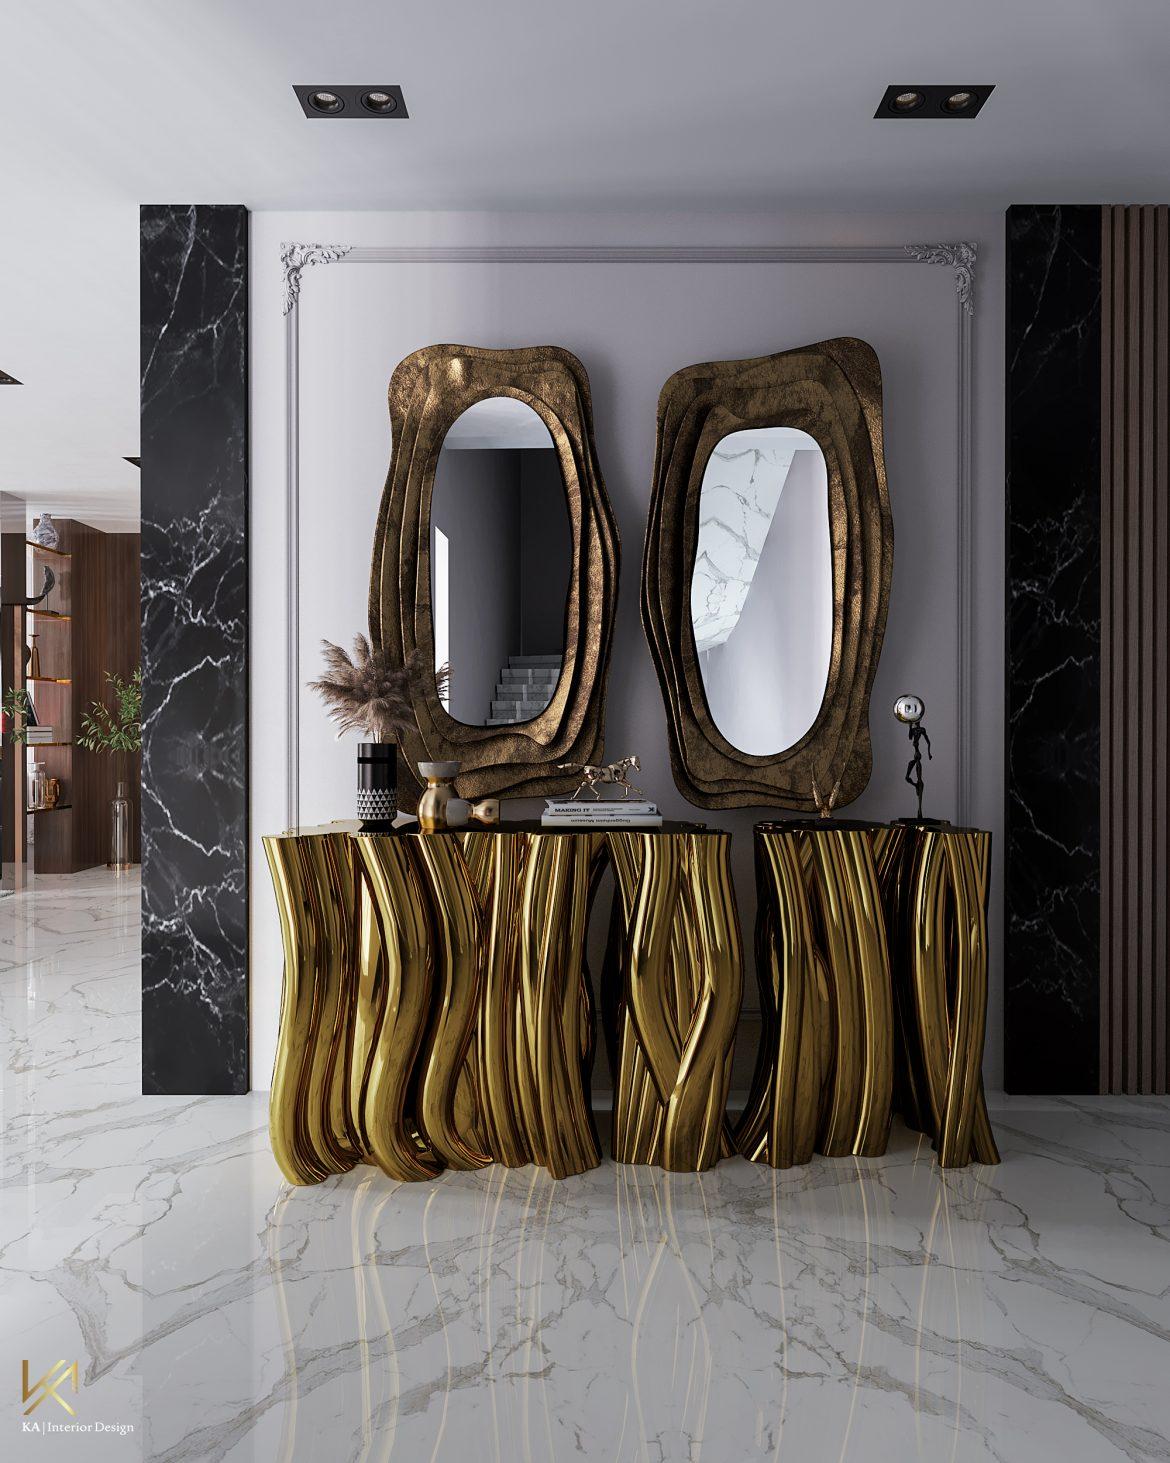 Covet House x K.A Interior Design:  A Opulent Modern Classic Villa In Riyadh covet house k a interior design opulent modern classic villa riyadh 2